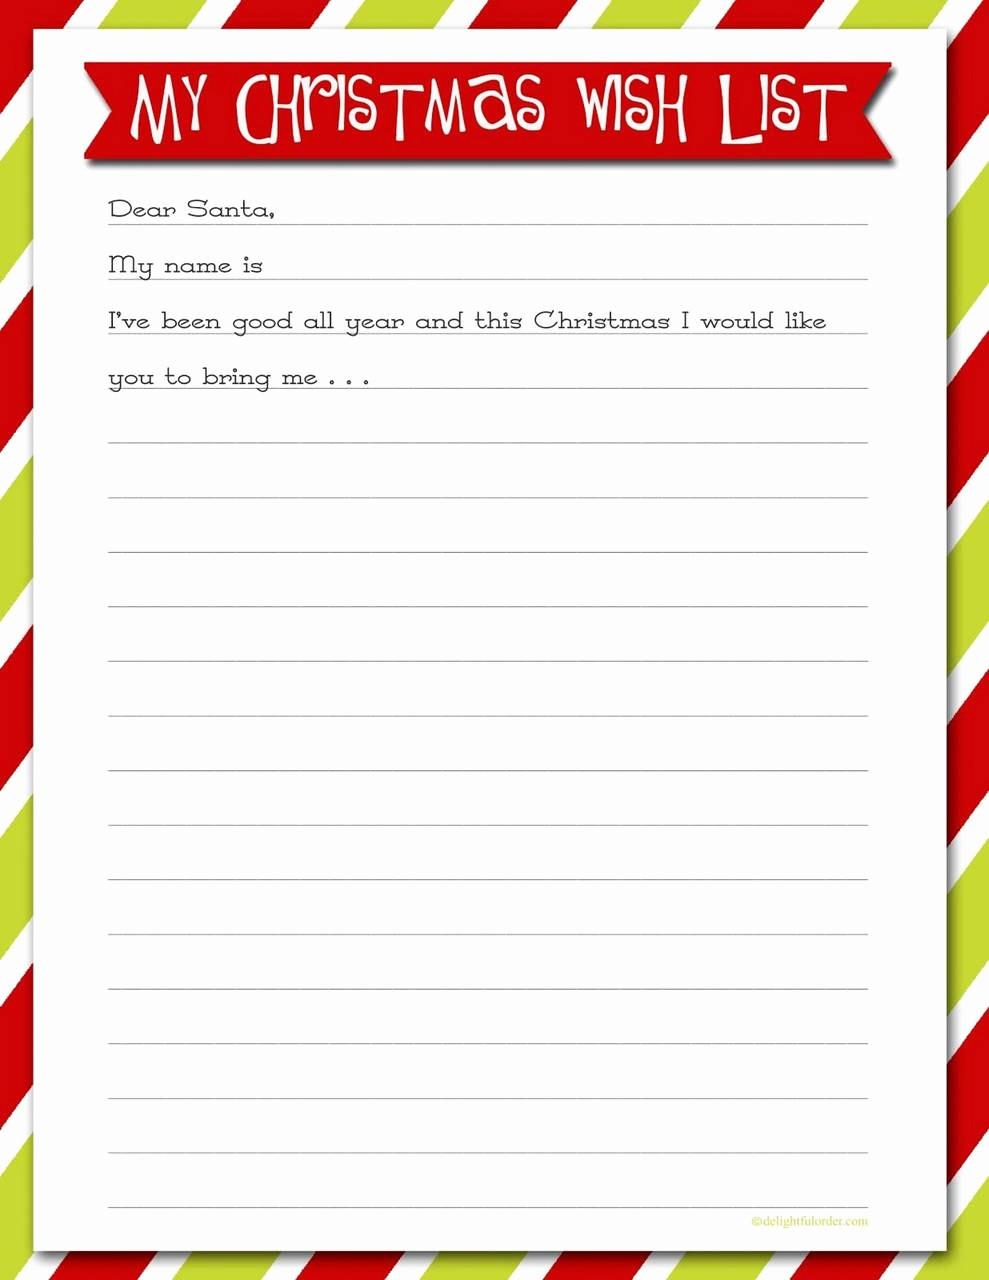 Wish List Template Microsoft Word Elegant 61 Inspirational Christmas Wish List Template Microsoft